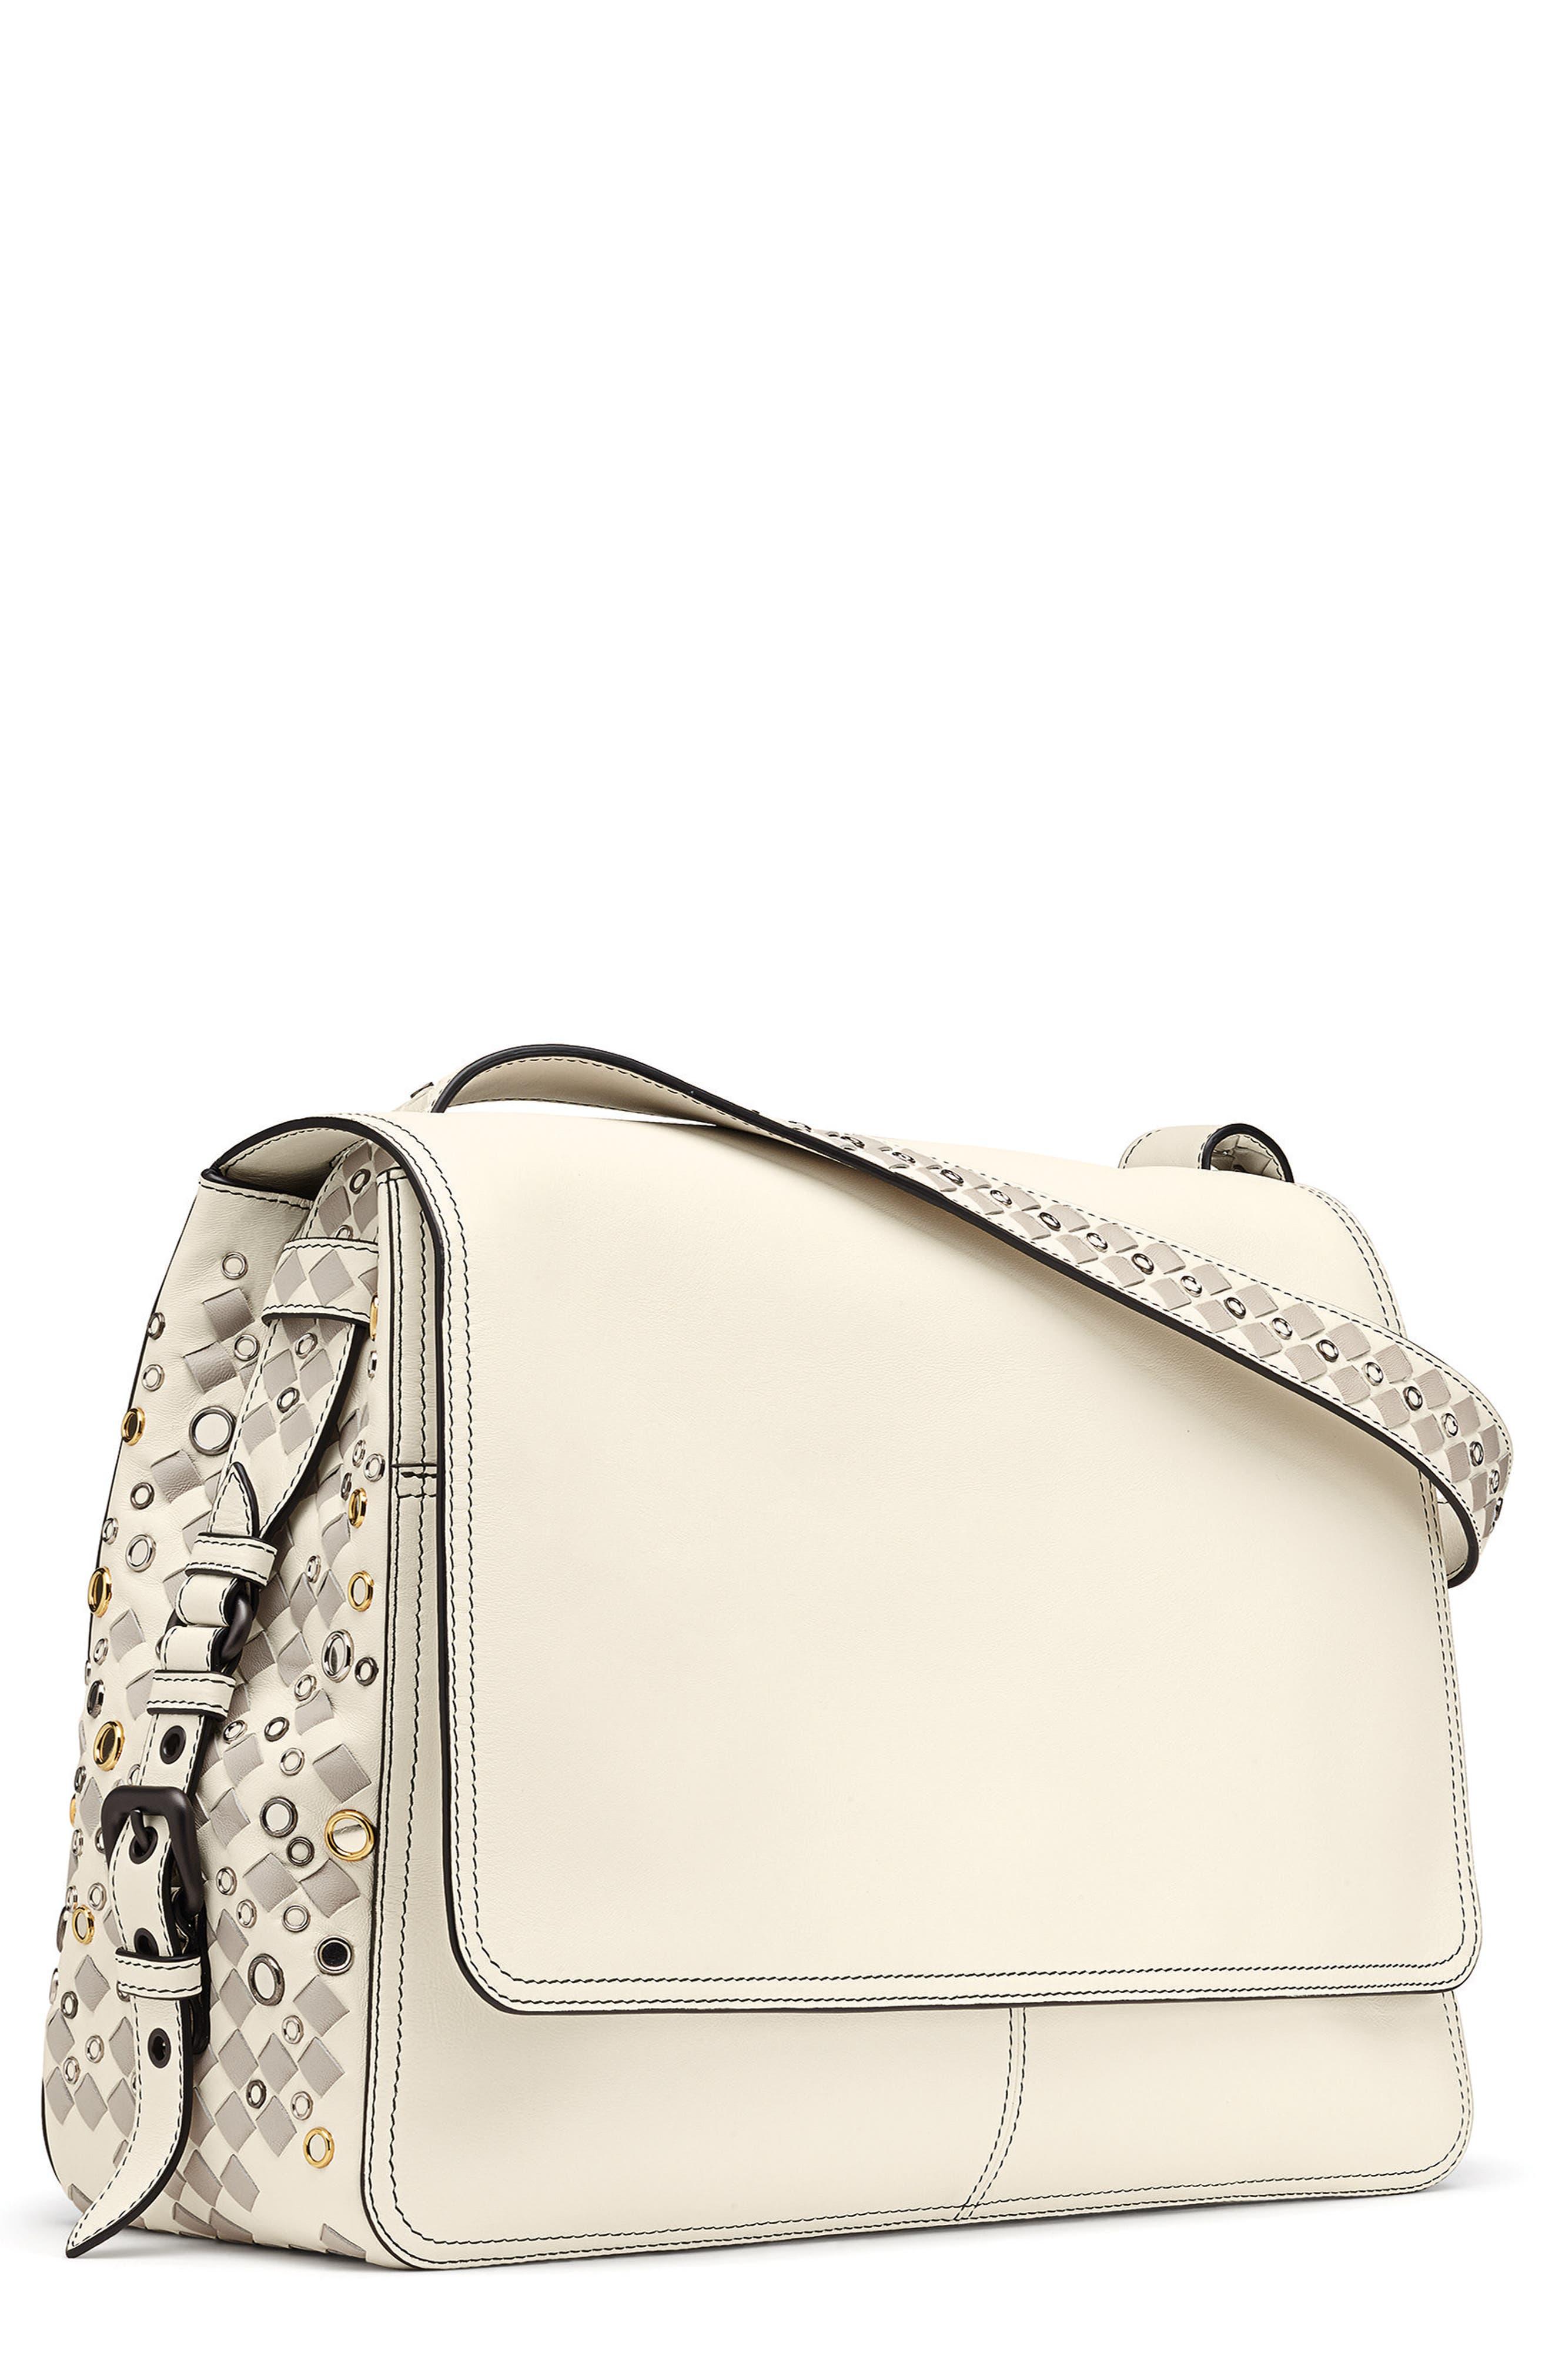 Intrecciato Leather Shoulder Bag,                         Main,                         color, Latte